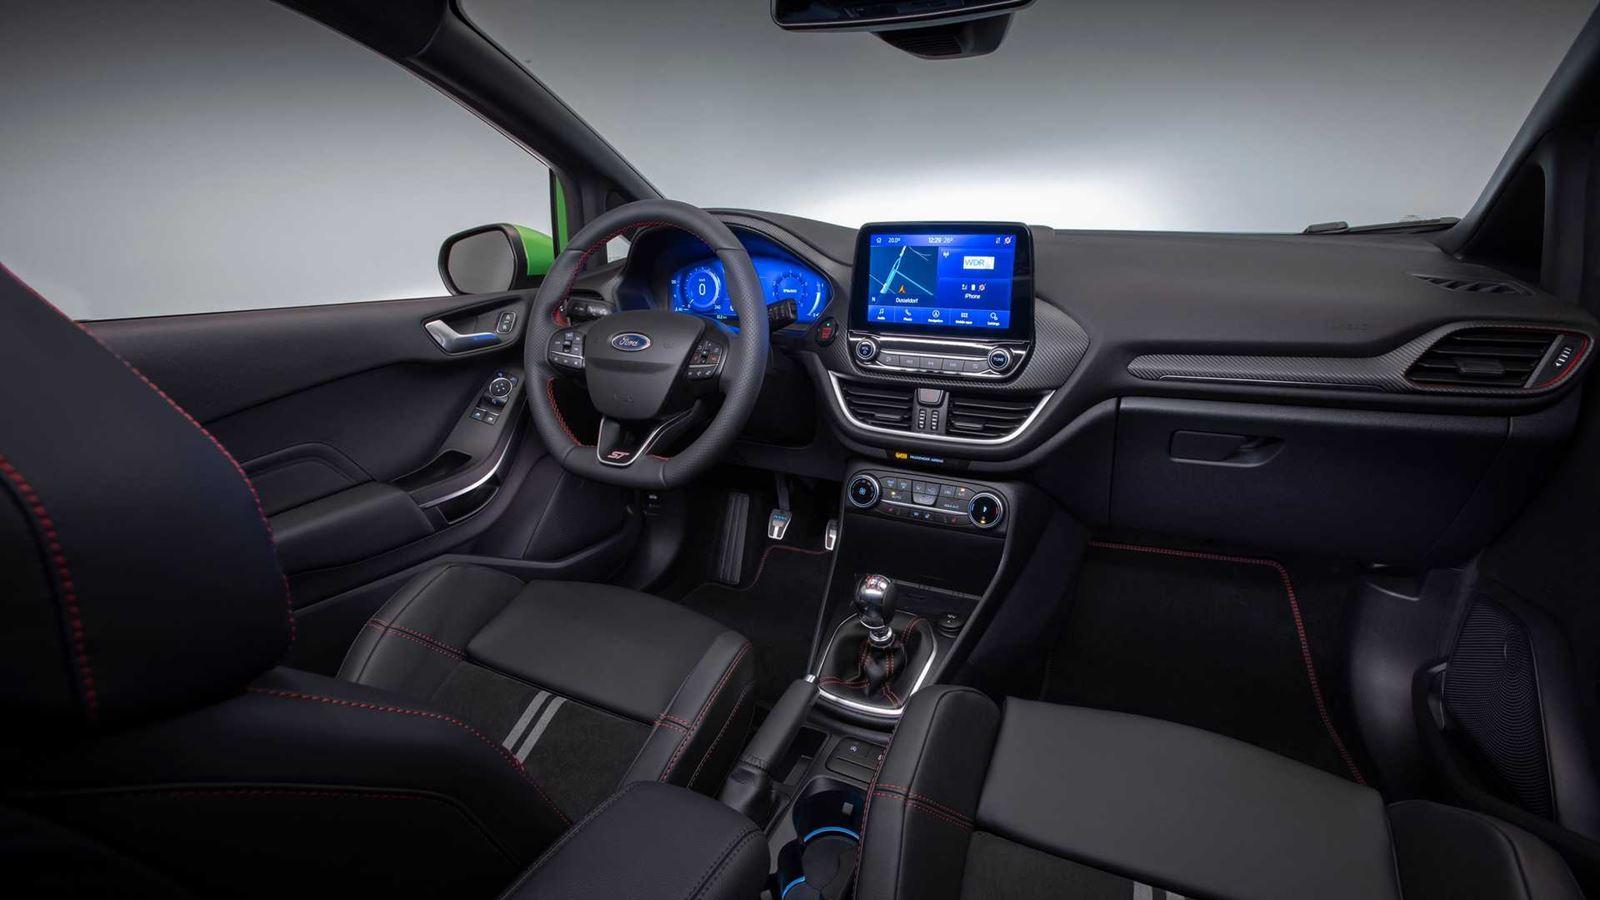 Ford Fiesta interior